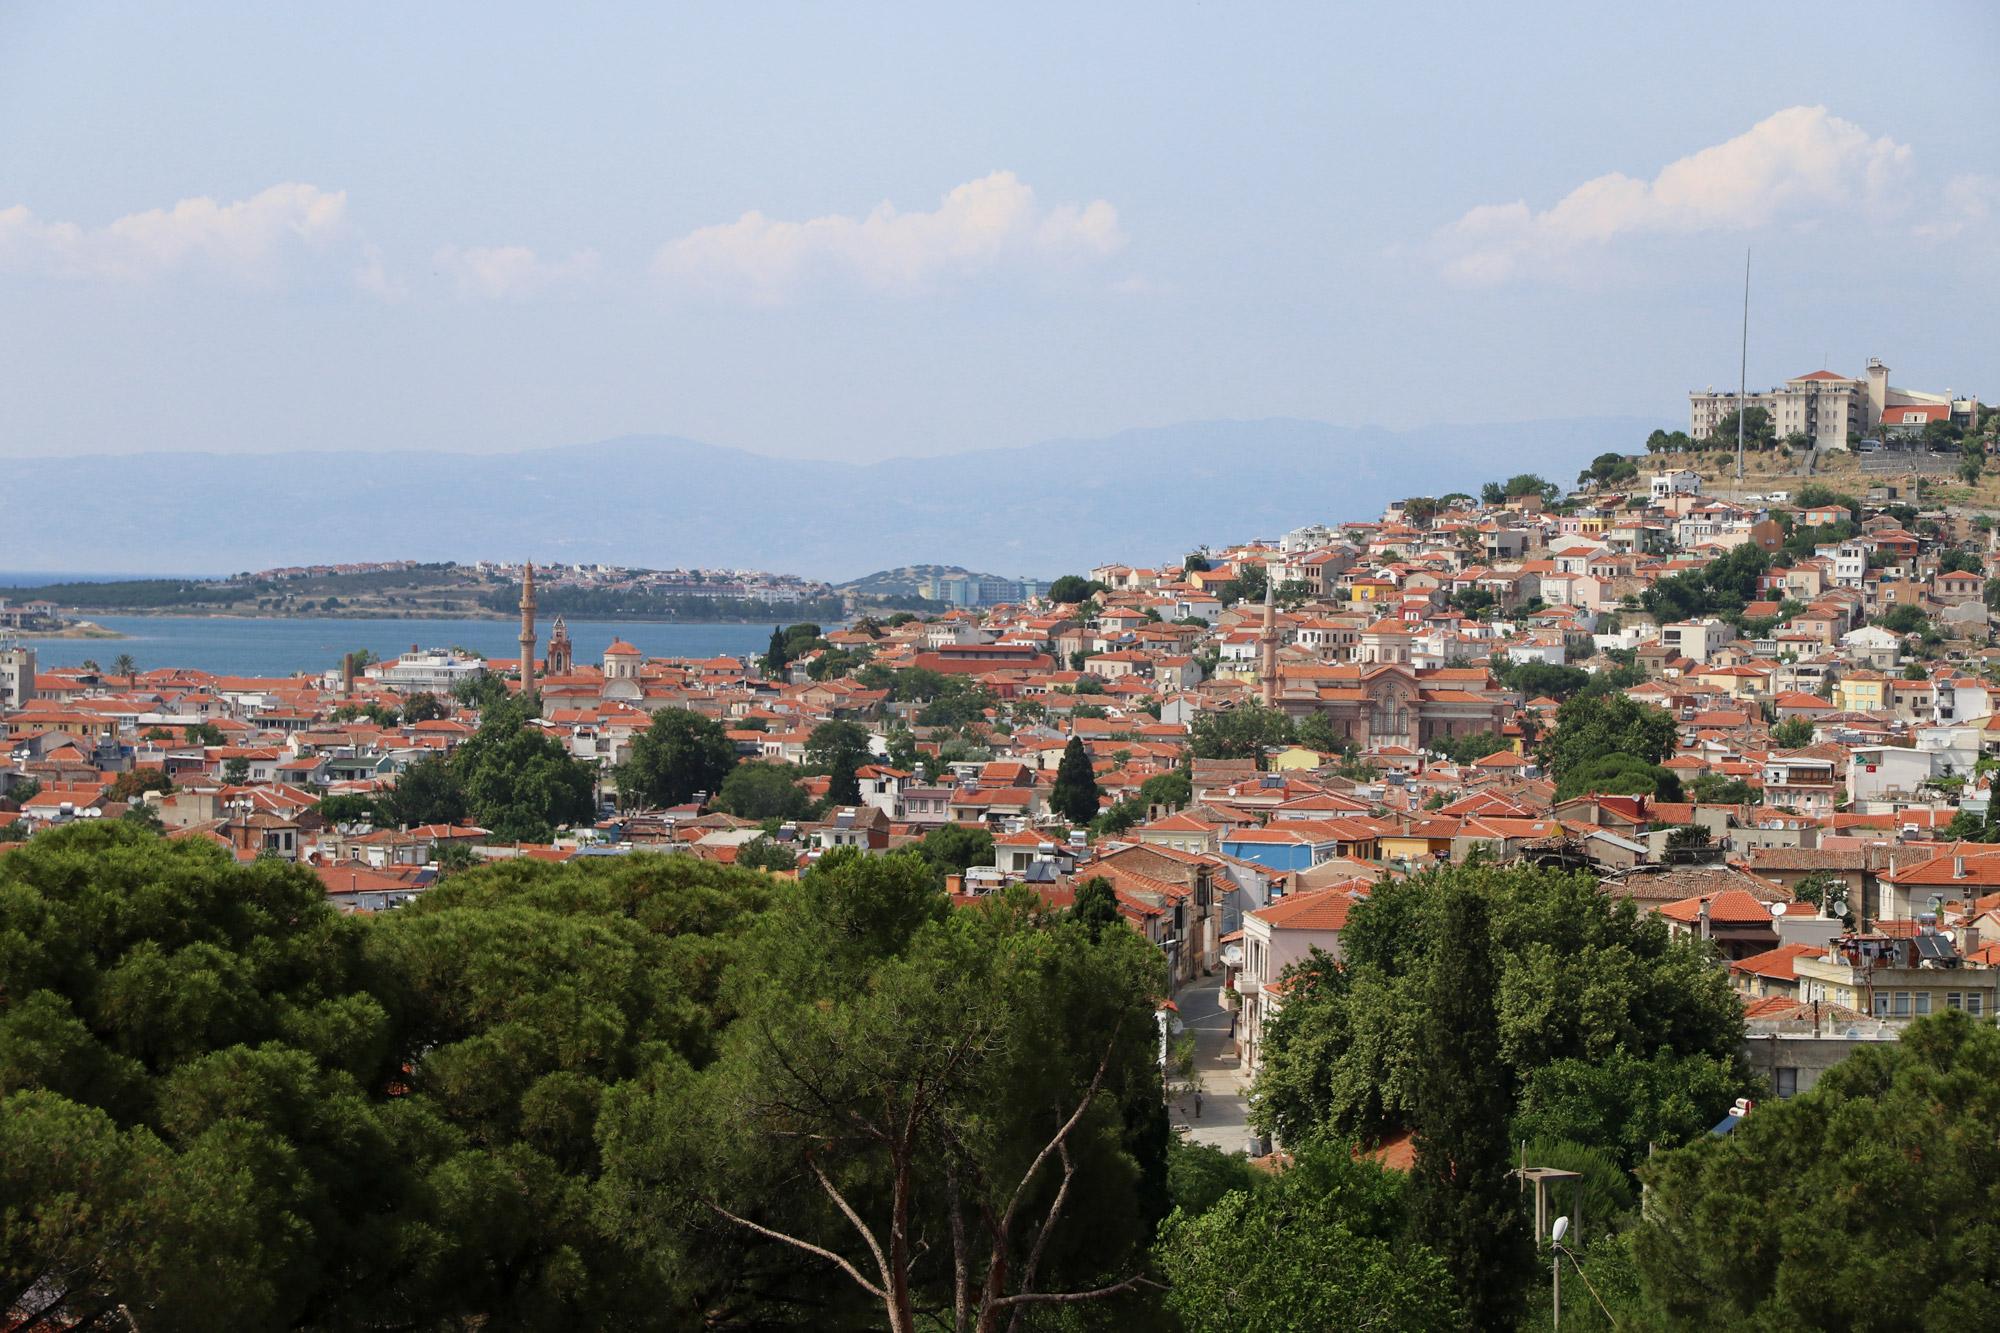 Turkije reisverslag: Bergama en Ayvalik - Uitzicht op Ayvalik